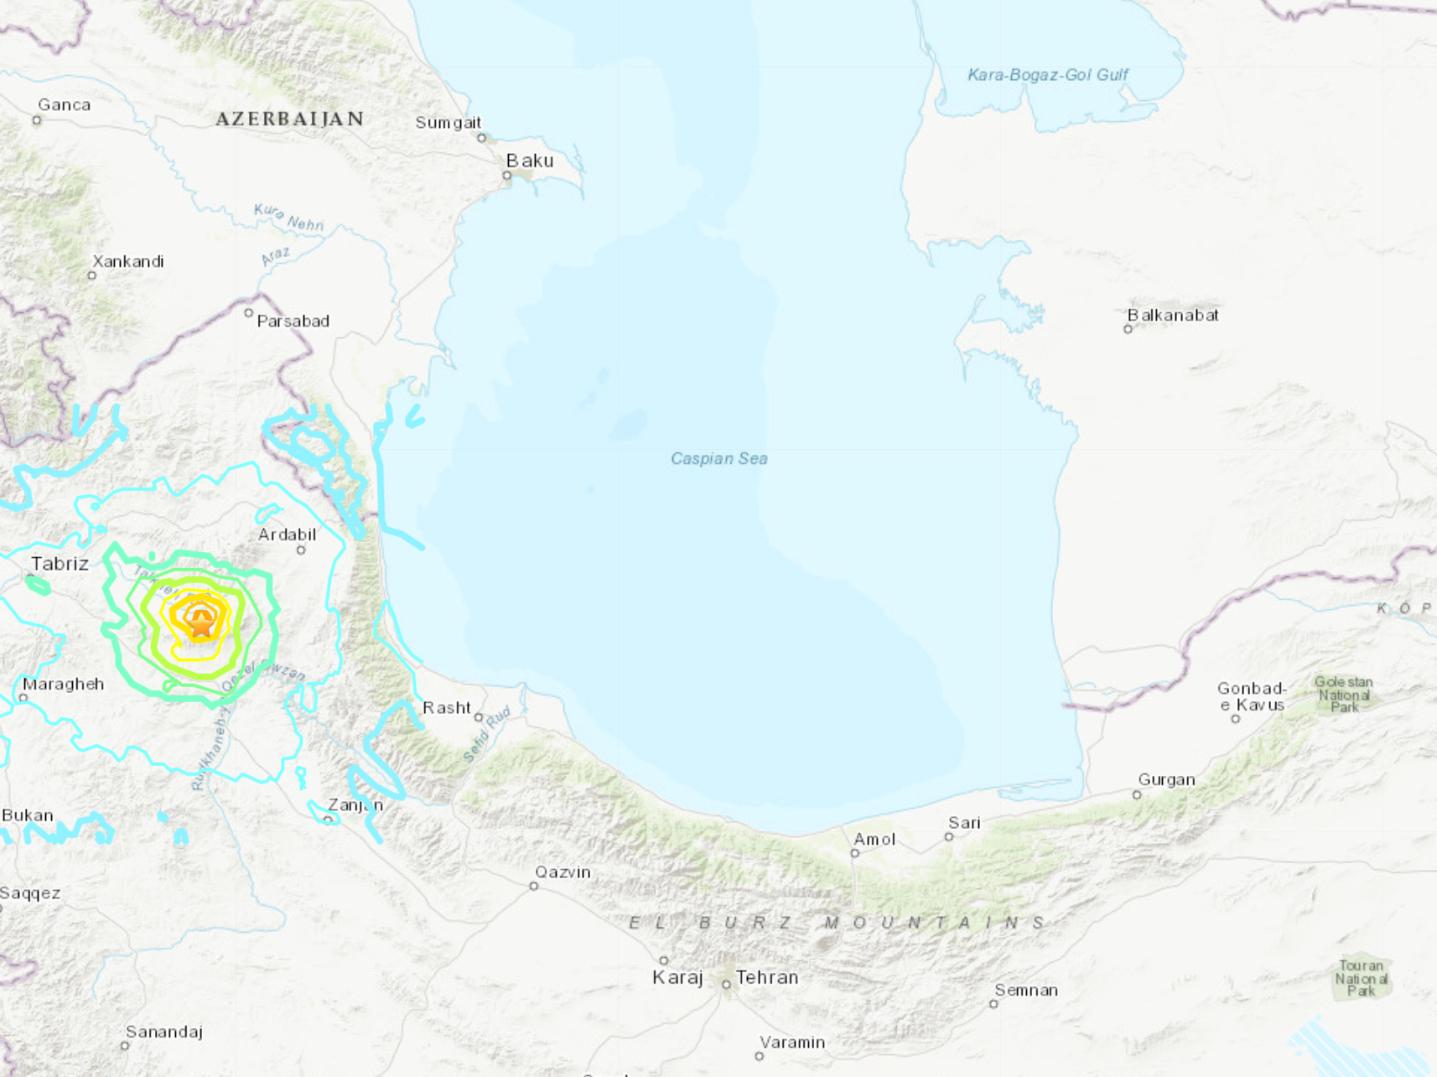 Shallow 5.9 earthquake hits northwestern Iran: USGS